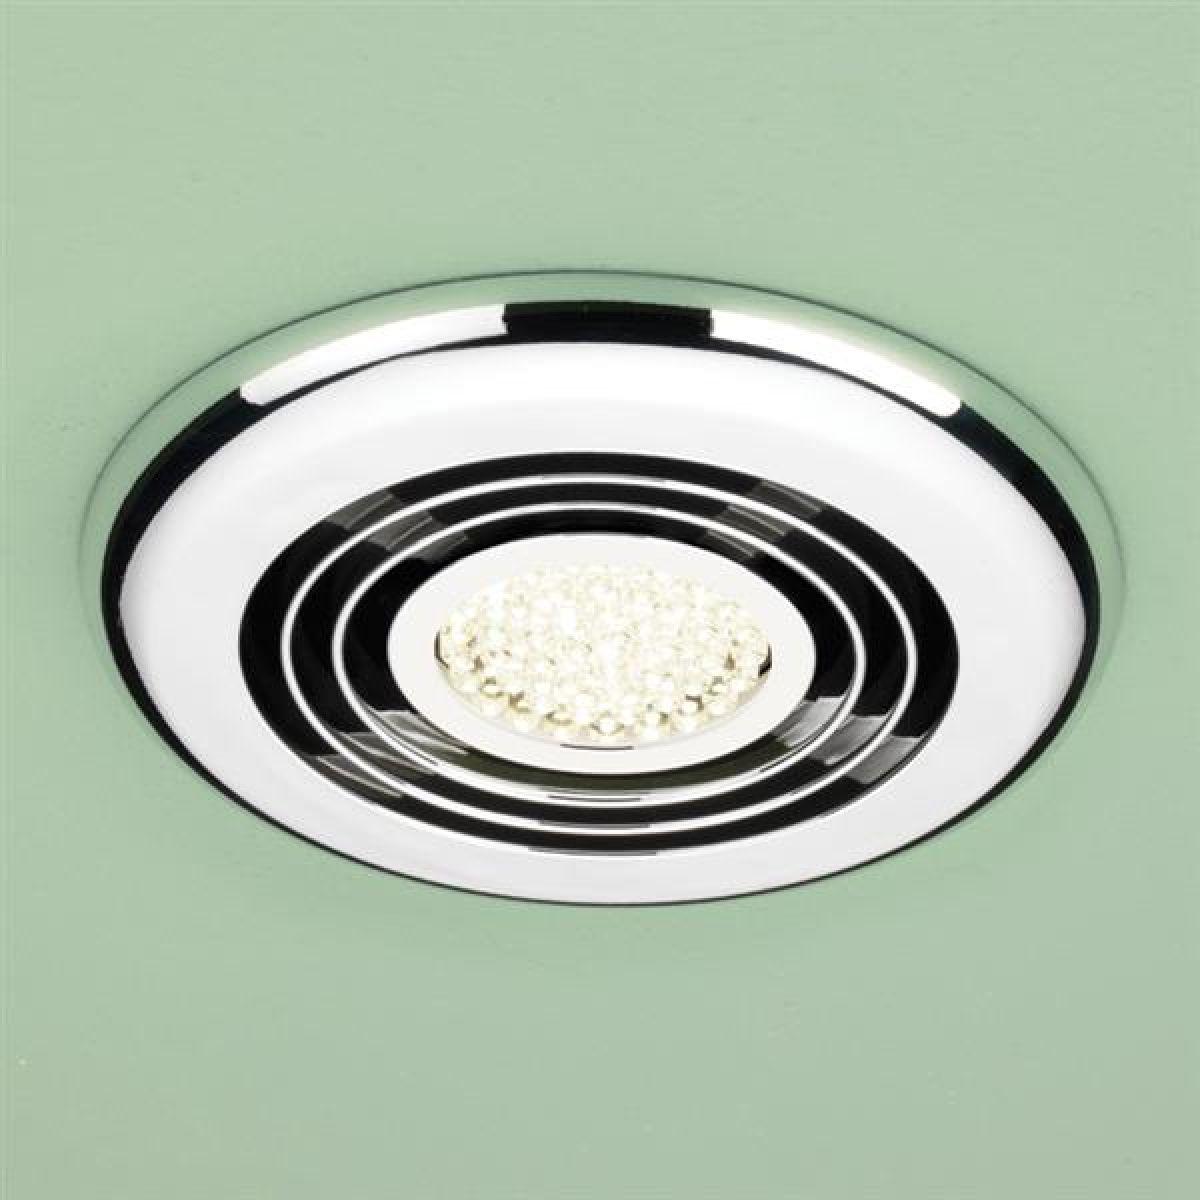 HiB Turbo Warm LED Inline Bathroom Extractor Fan in Chrome